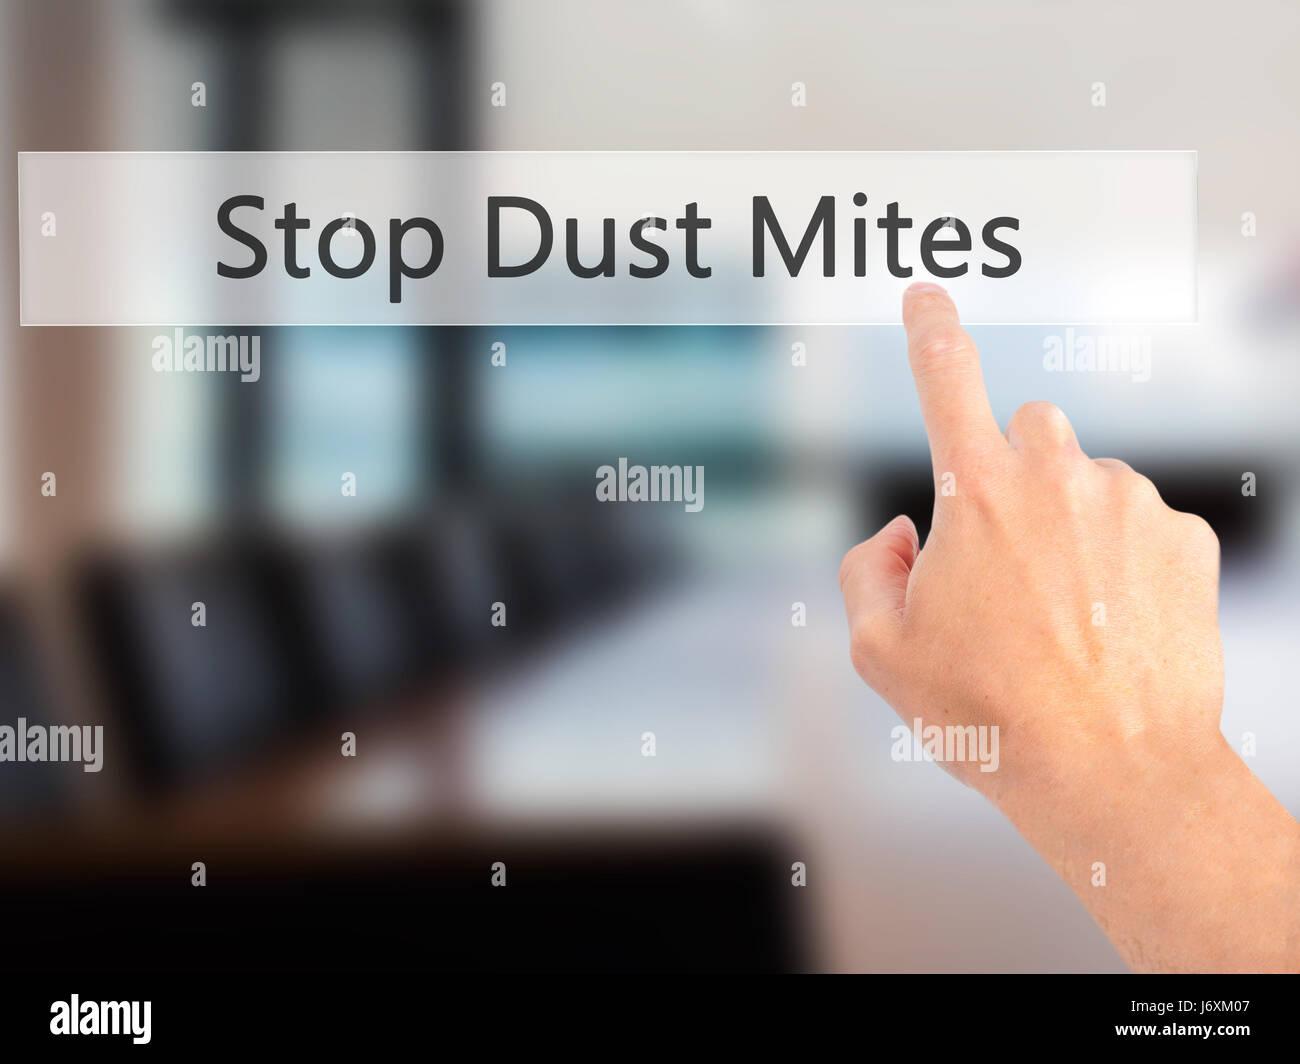 Dust Mites Stock Photos & Dust Mites Stock Images - Alamy